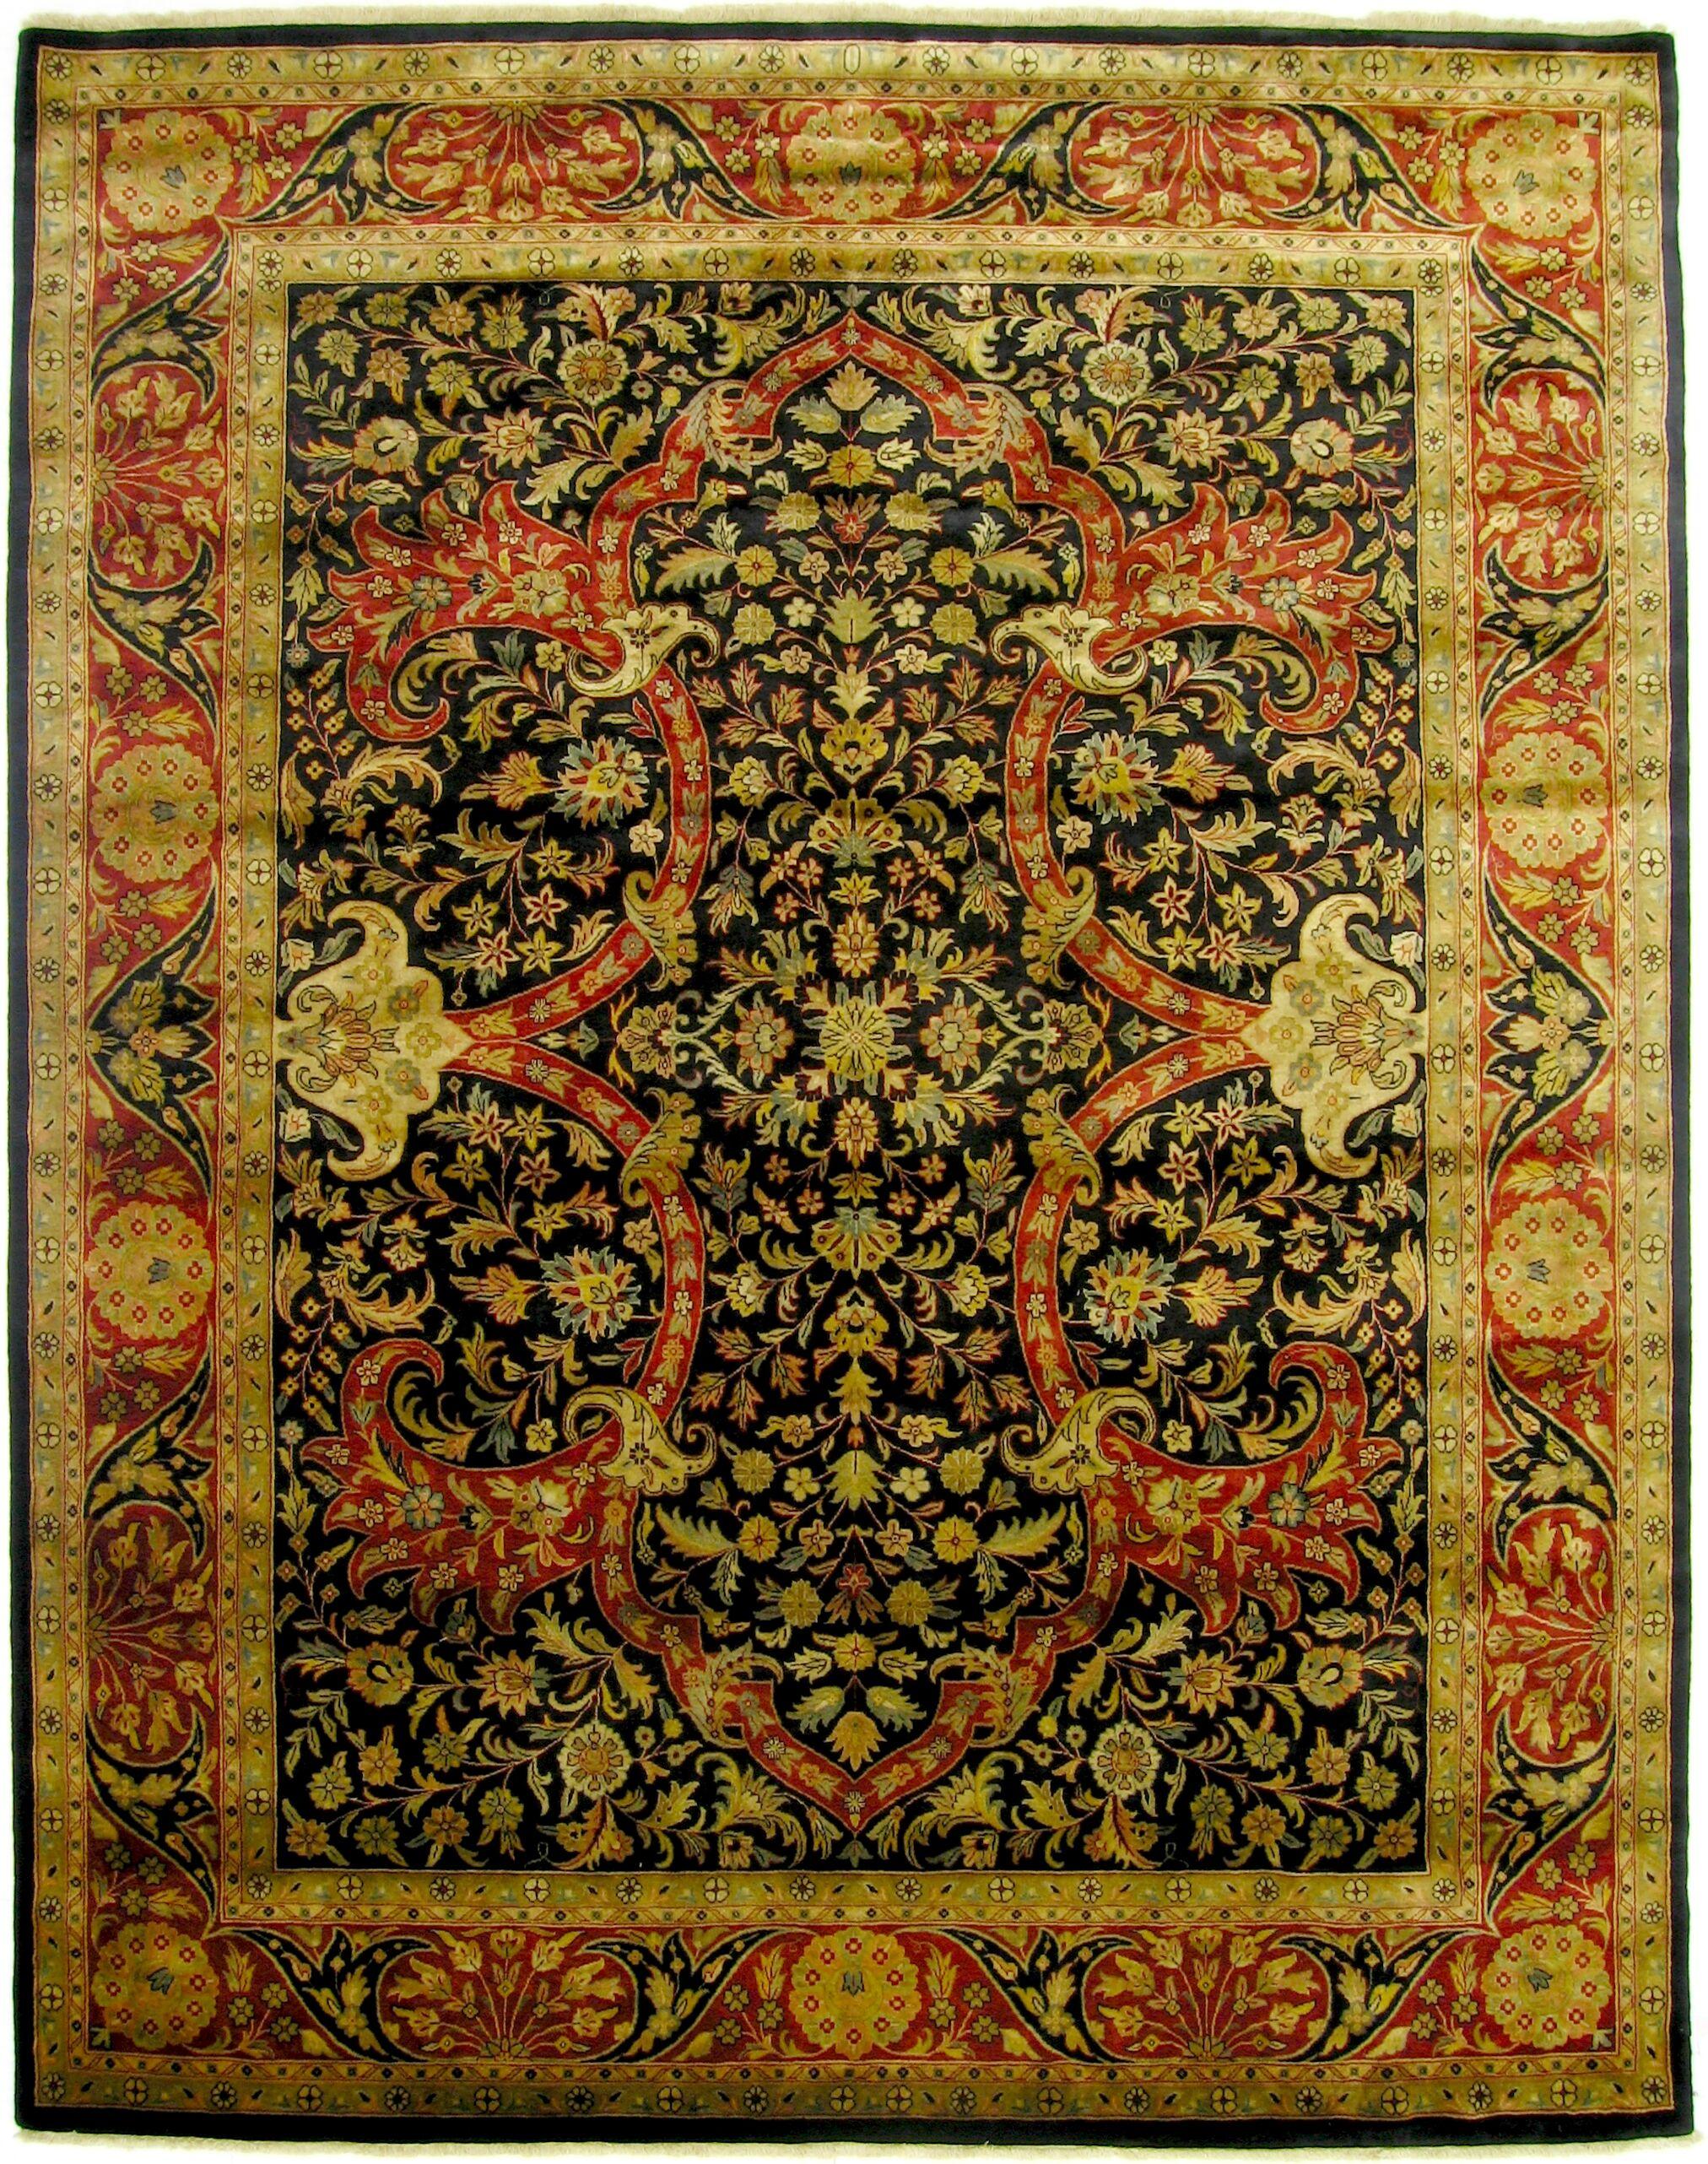 Kashan Hand-Knotted Wool Beige/Black Area Rug